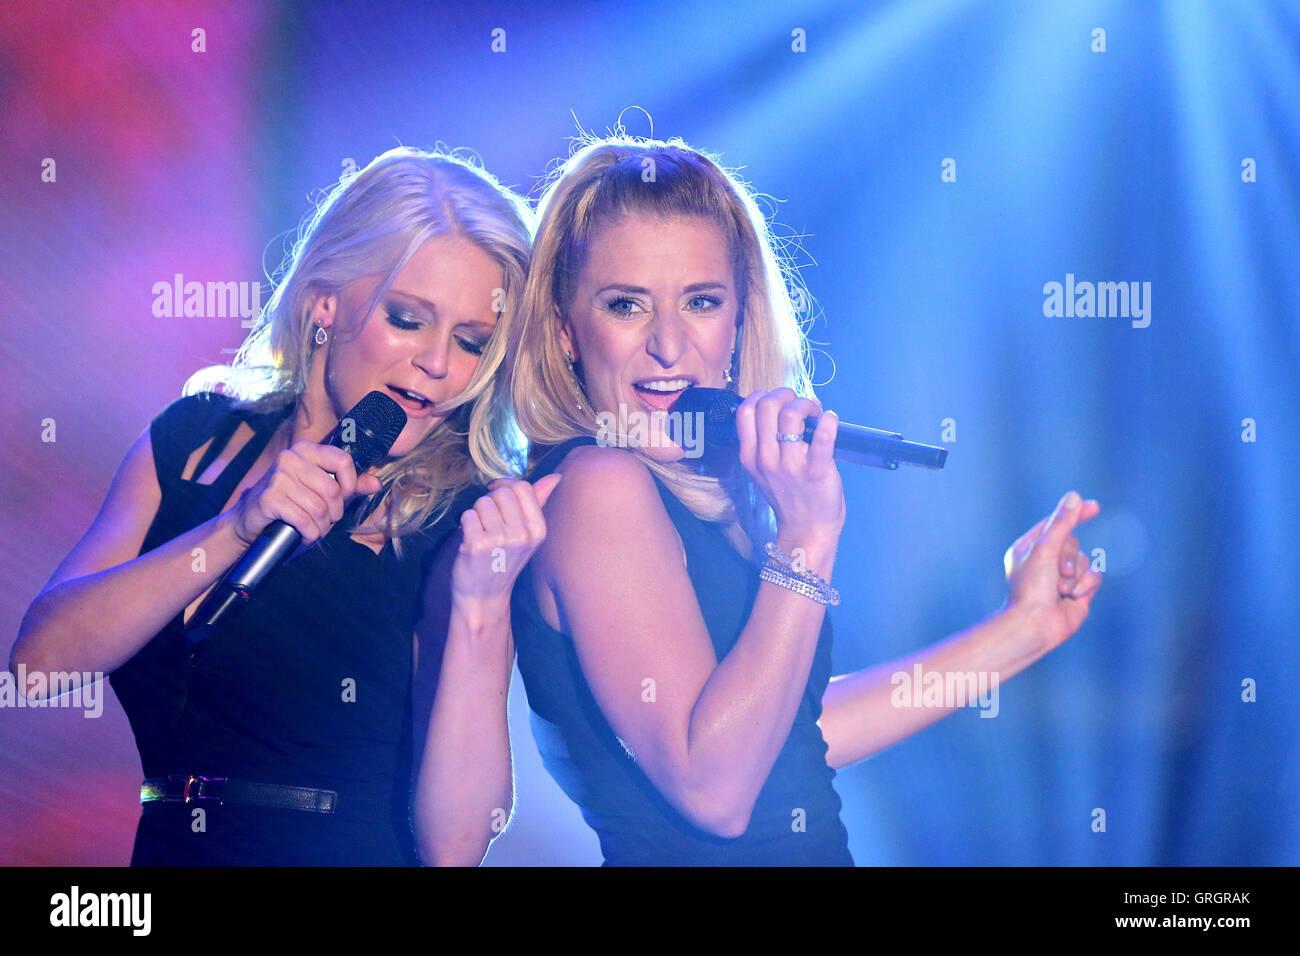 MDR hostess e cantante Stefanie Hertel (R) canta con Julia